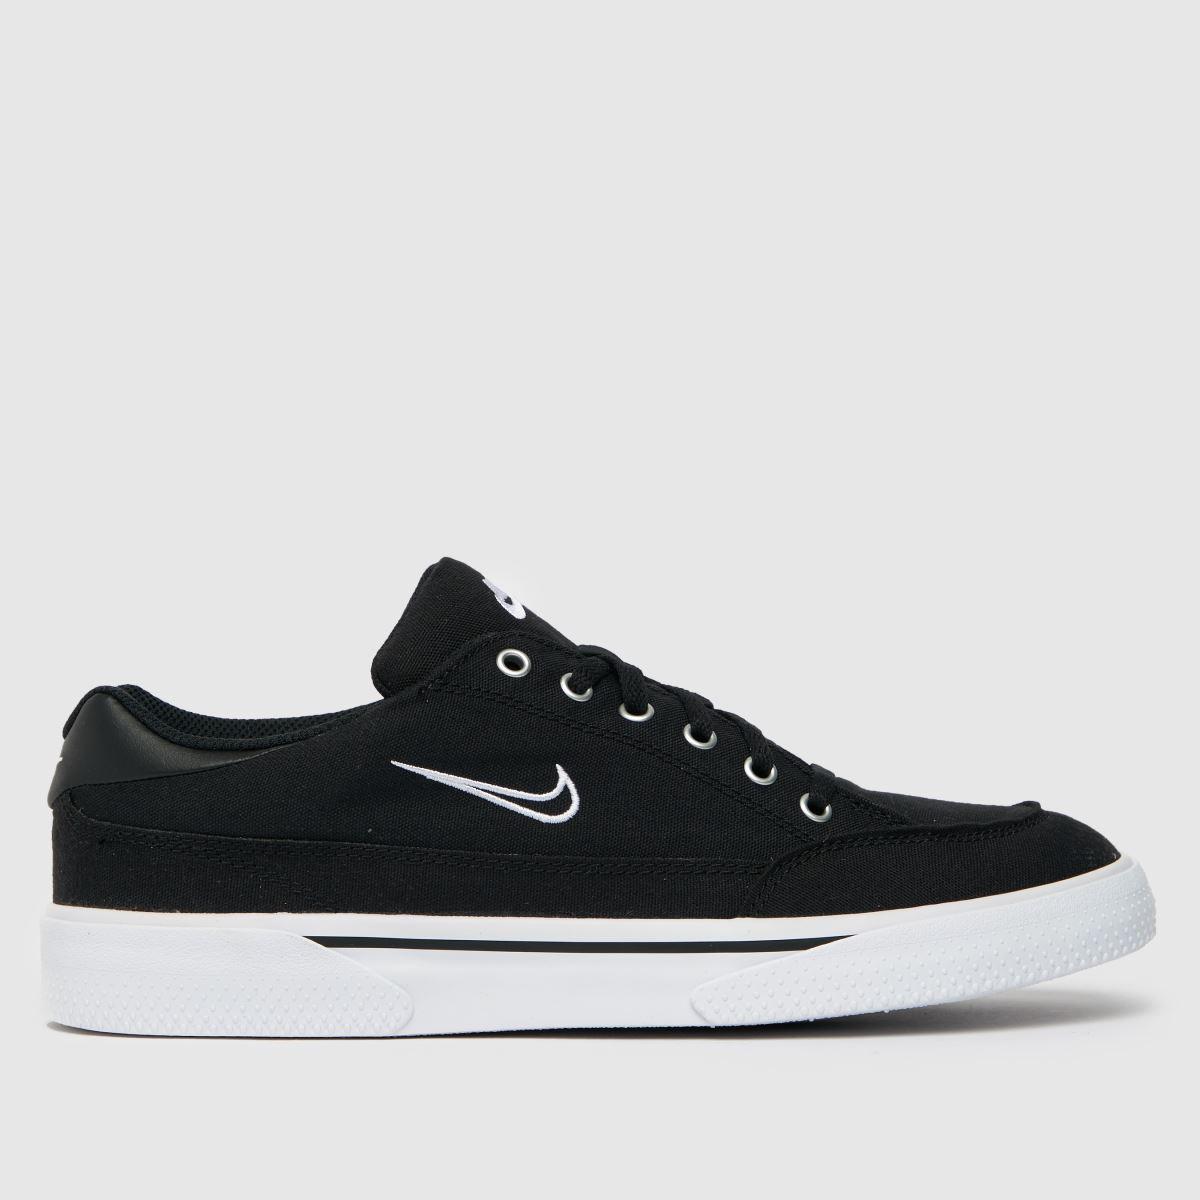 Nike Black & White Retro Gts Trainers